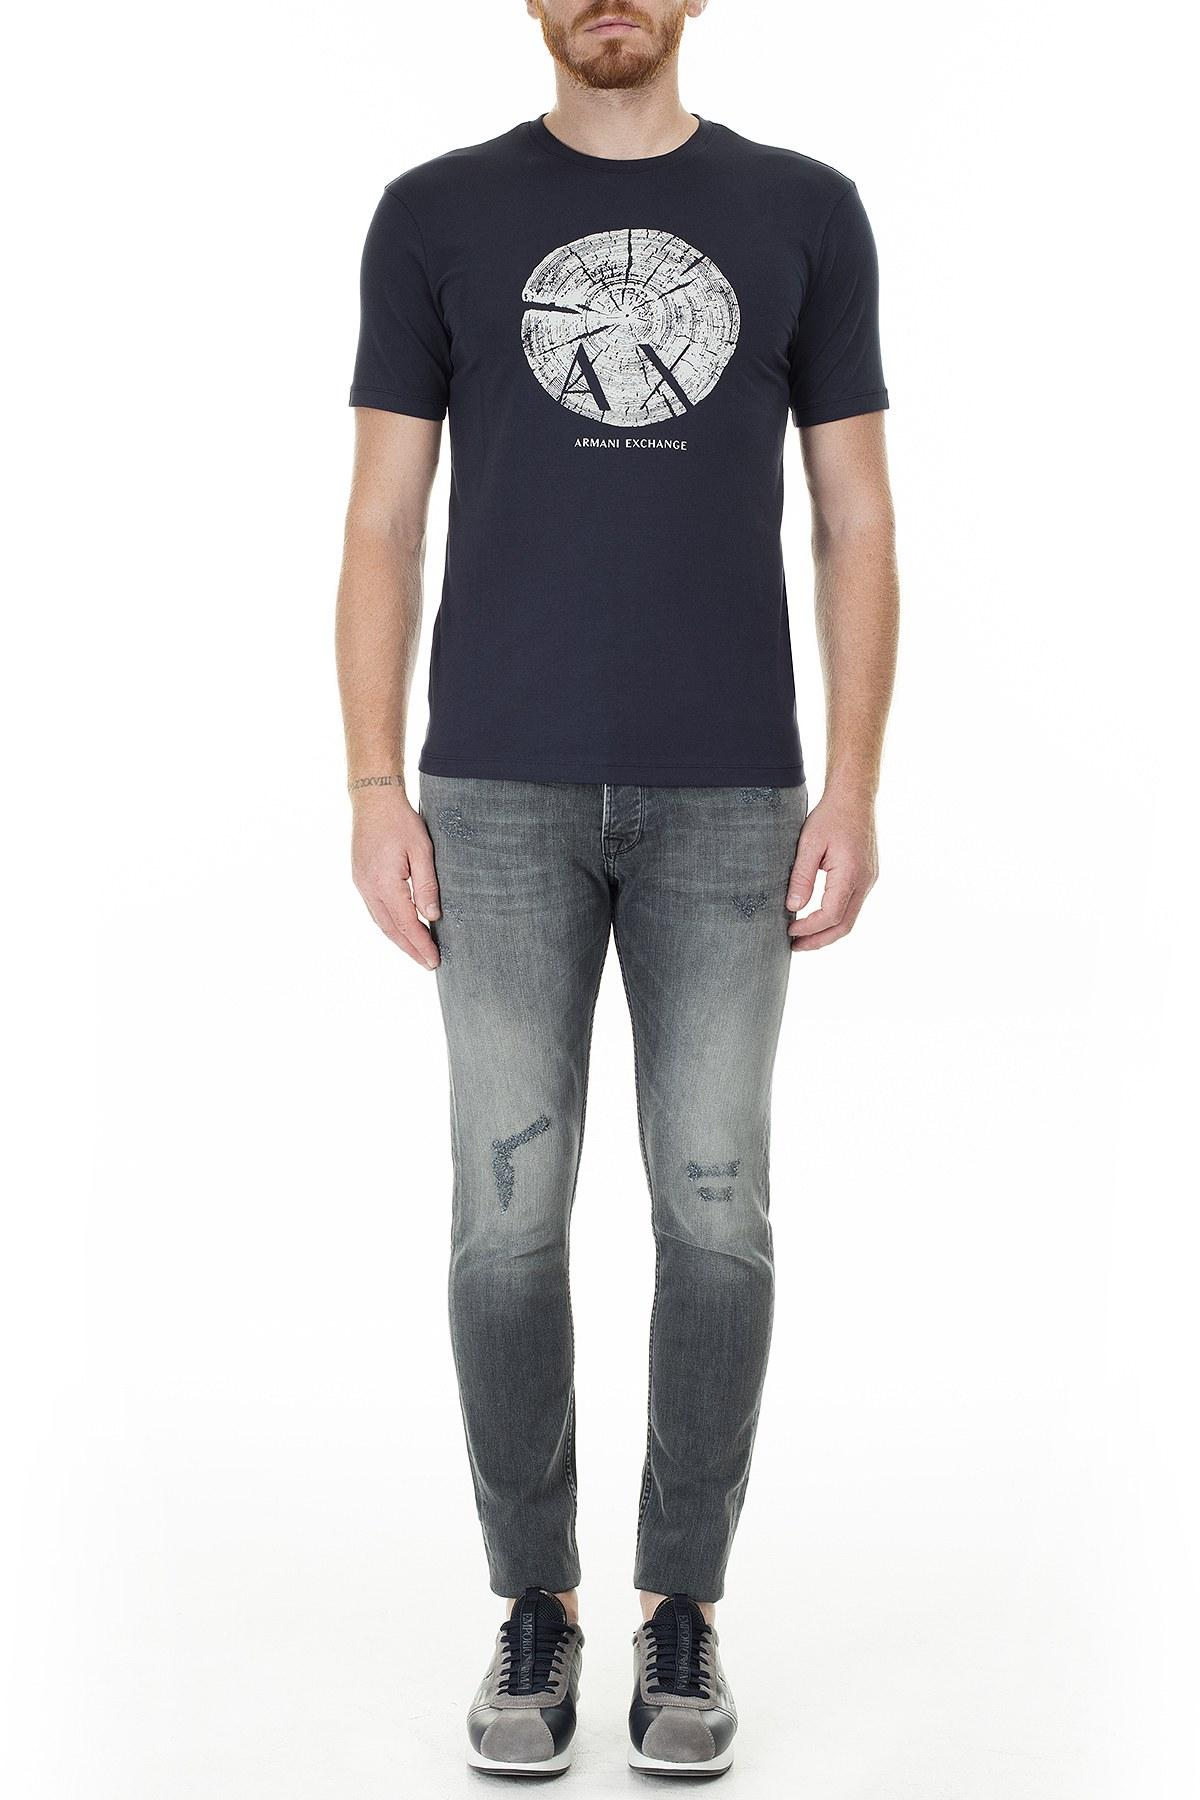 Armani Exchange Baskılı Bisiklet Yaka Slim Fit Erkek T Shirt 3HZTHG ZJE6Z 1510 LACİVERT